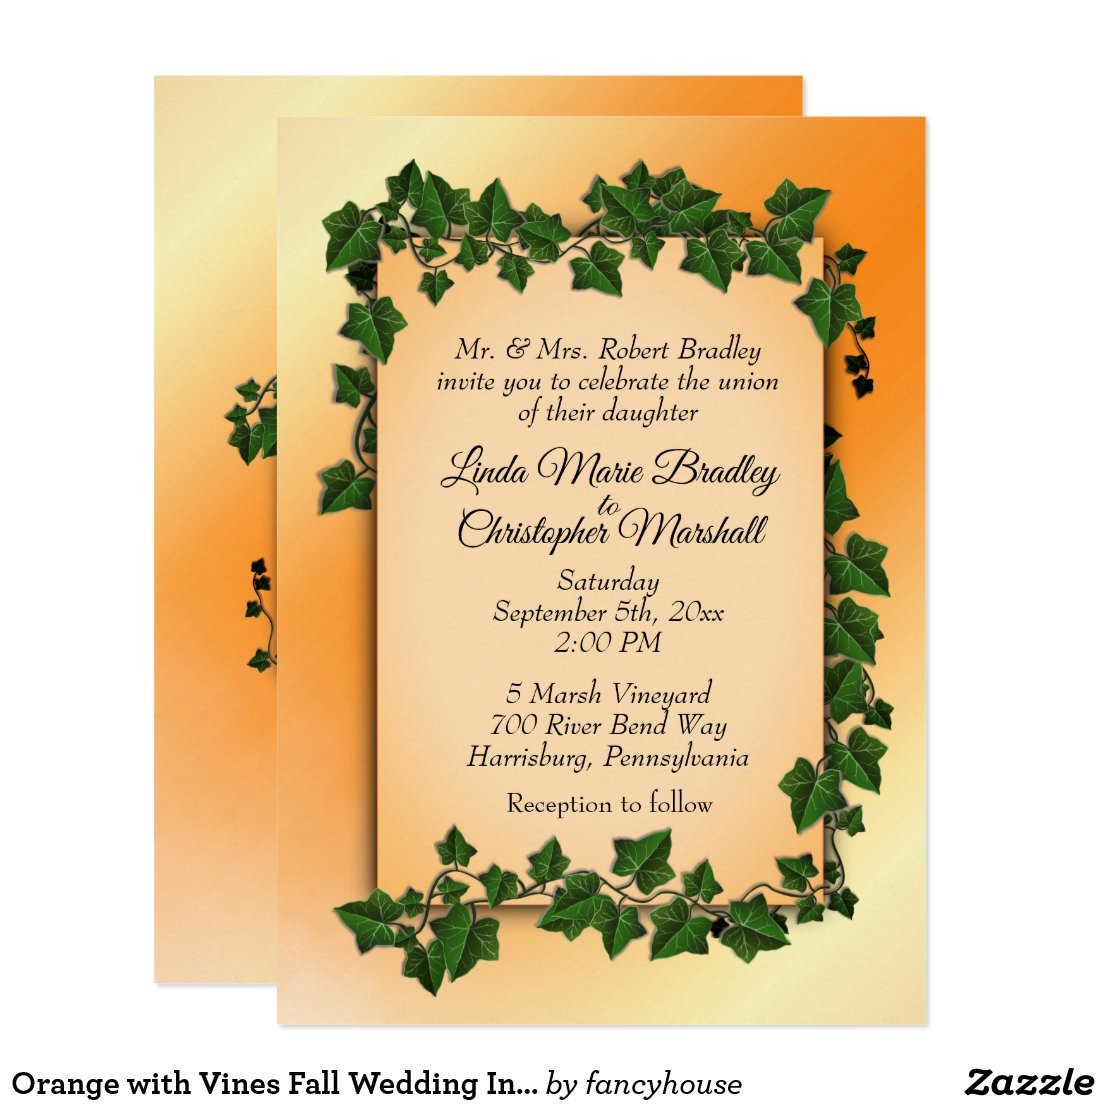 Orange with Vines Fall Wedding Invitation